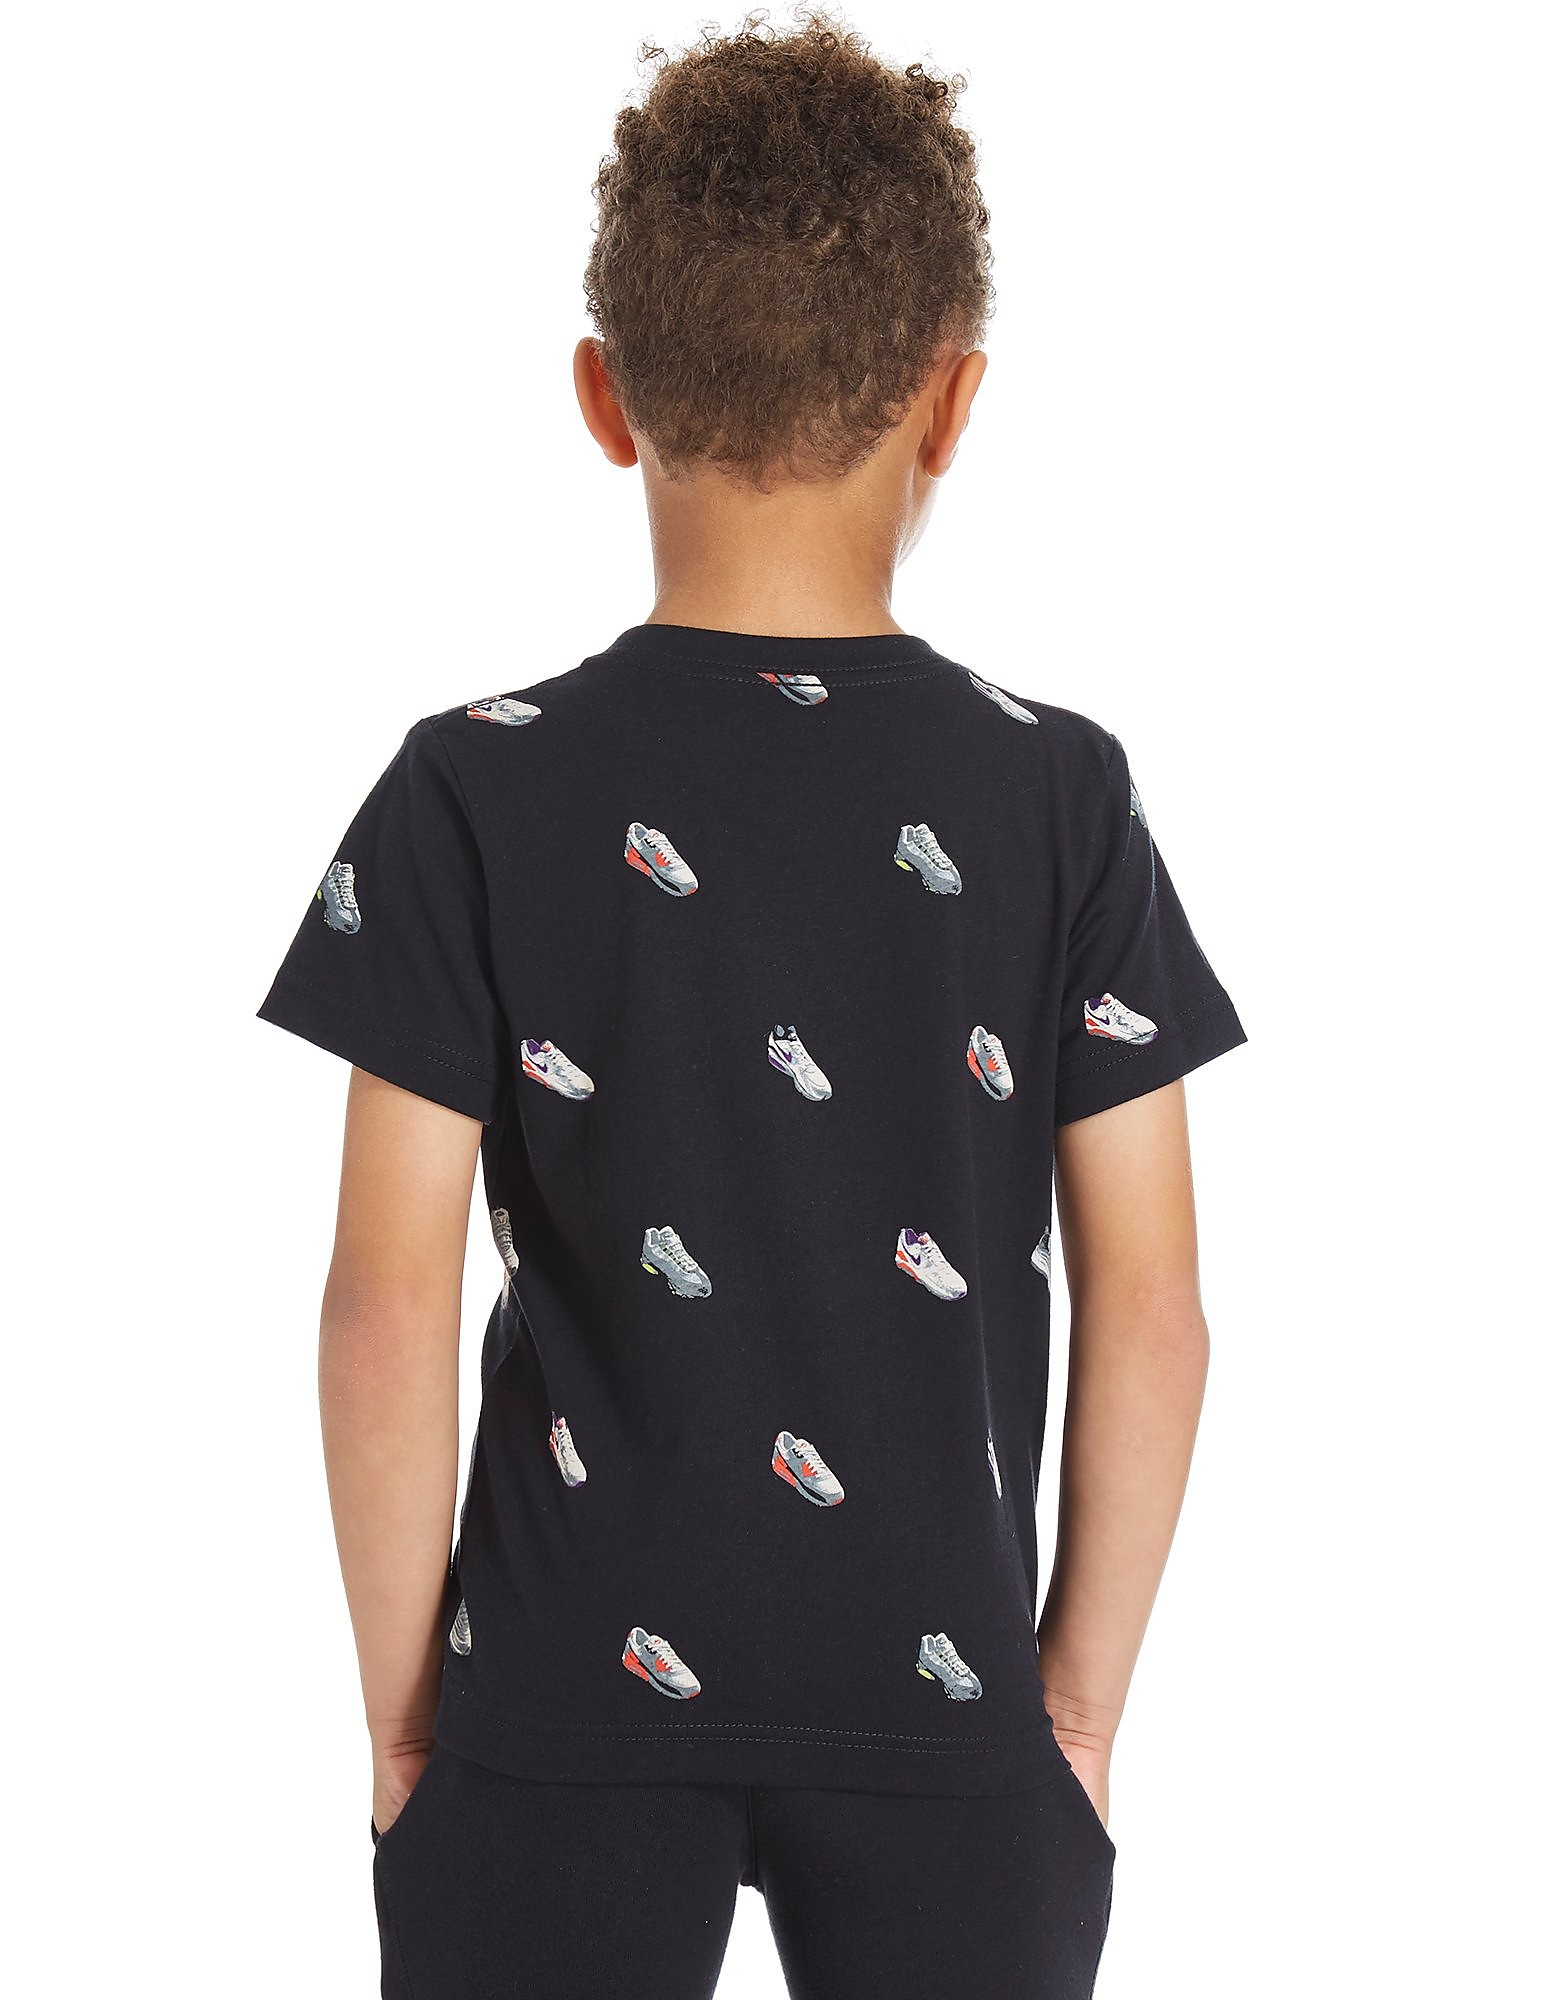 Nike camiseta Air Shoe Print infantil